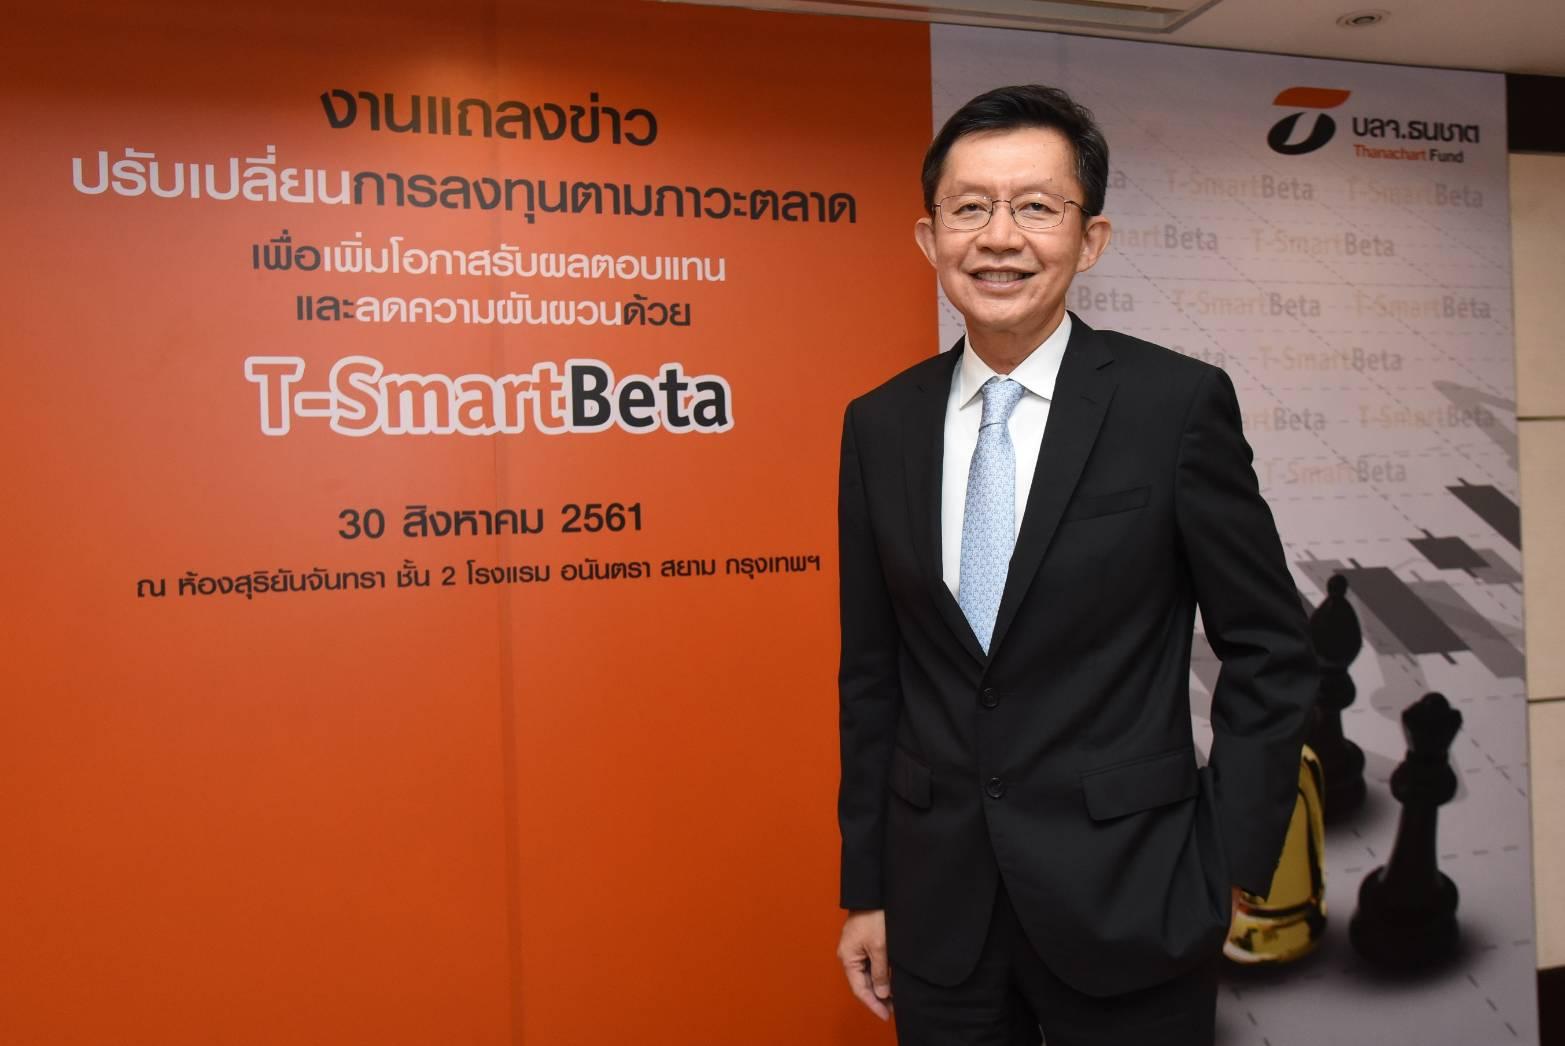 T-SmartBeta